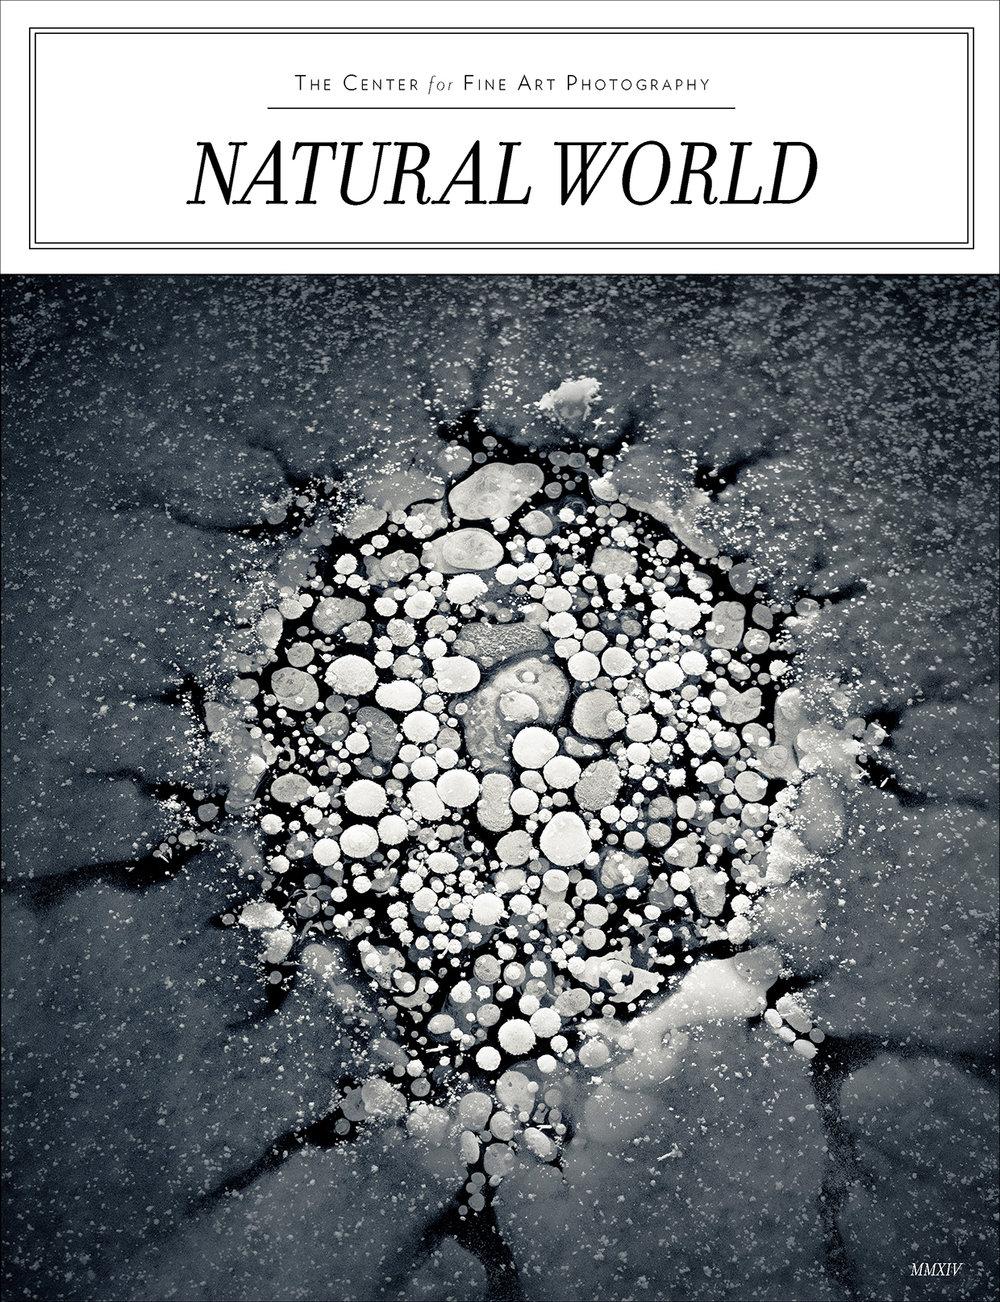 Naturalworldstrokle.jpg